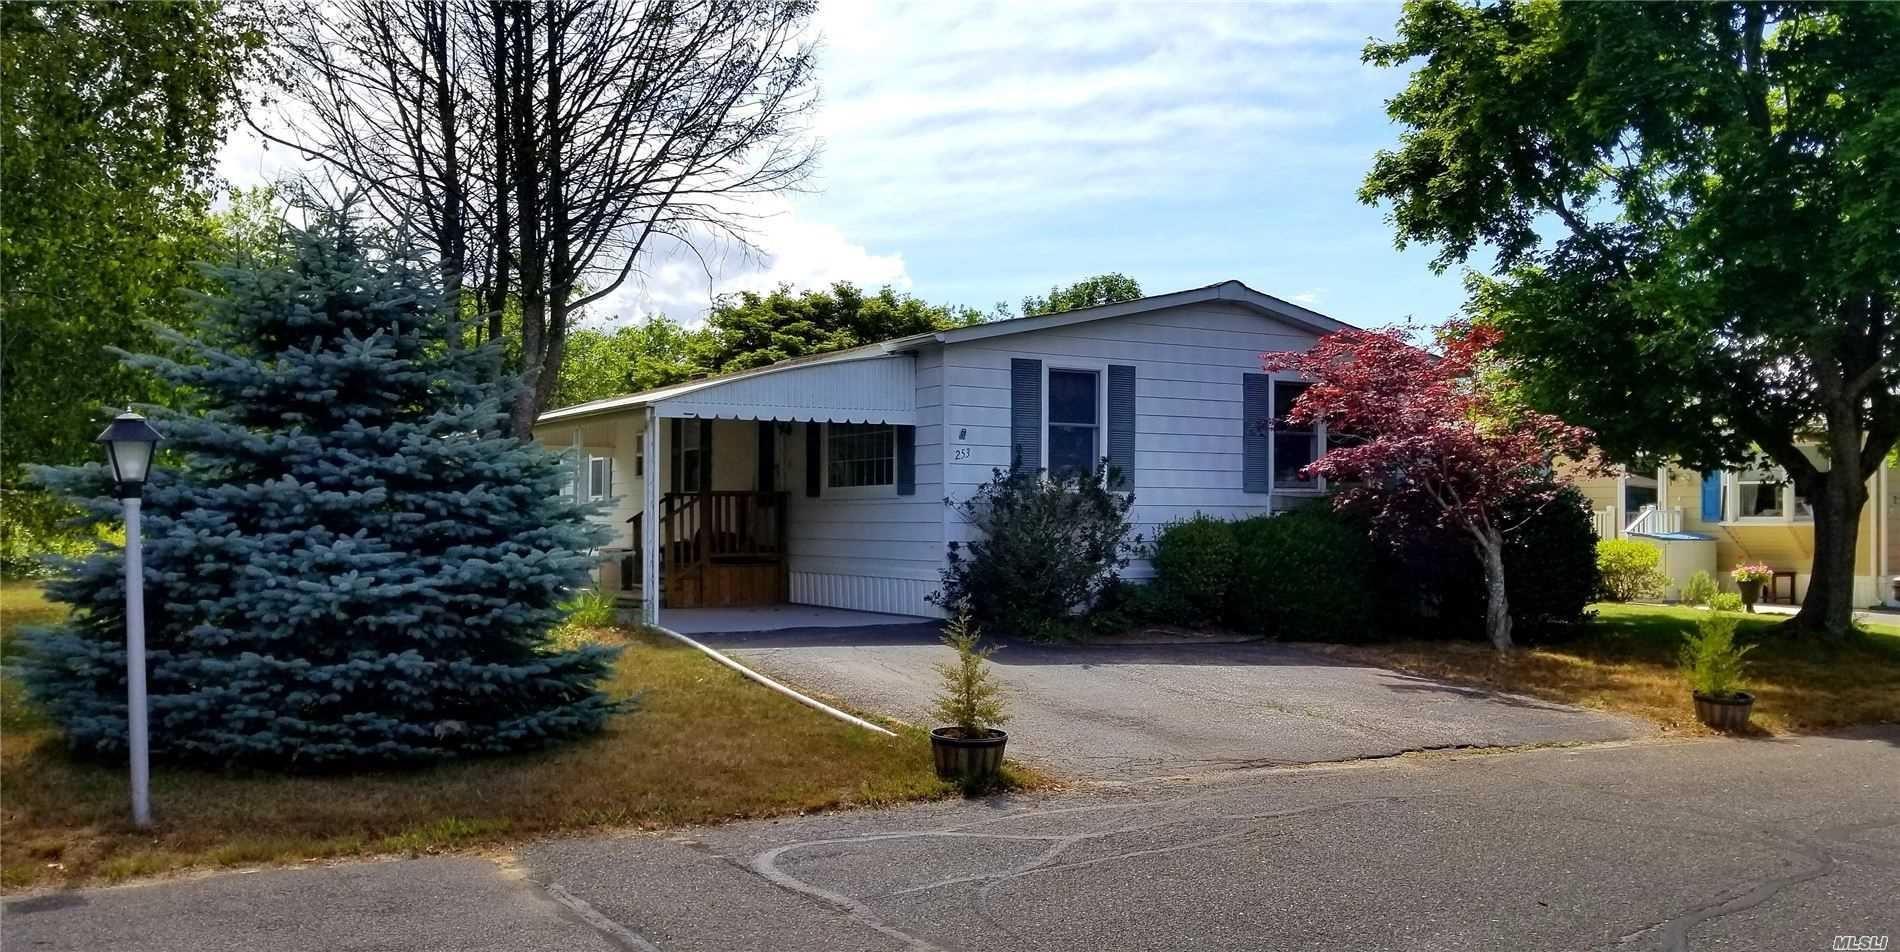 703- # 253 Fresh Pond Avenue, Calverton, NY 11933 - MLS#: 3229128